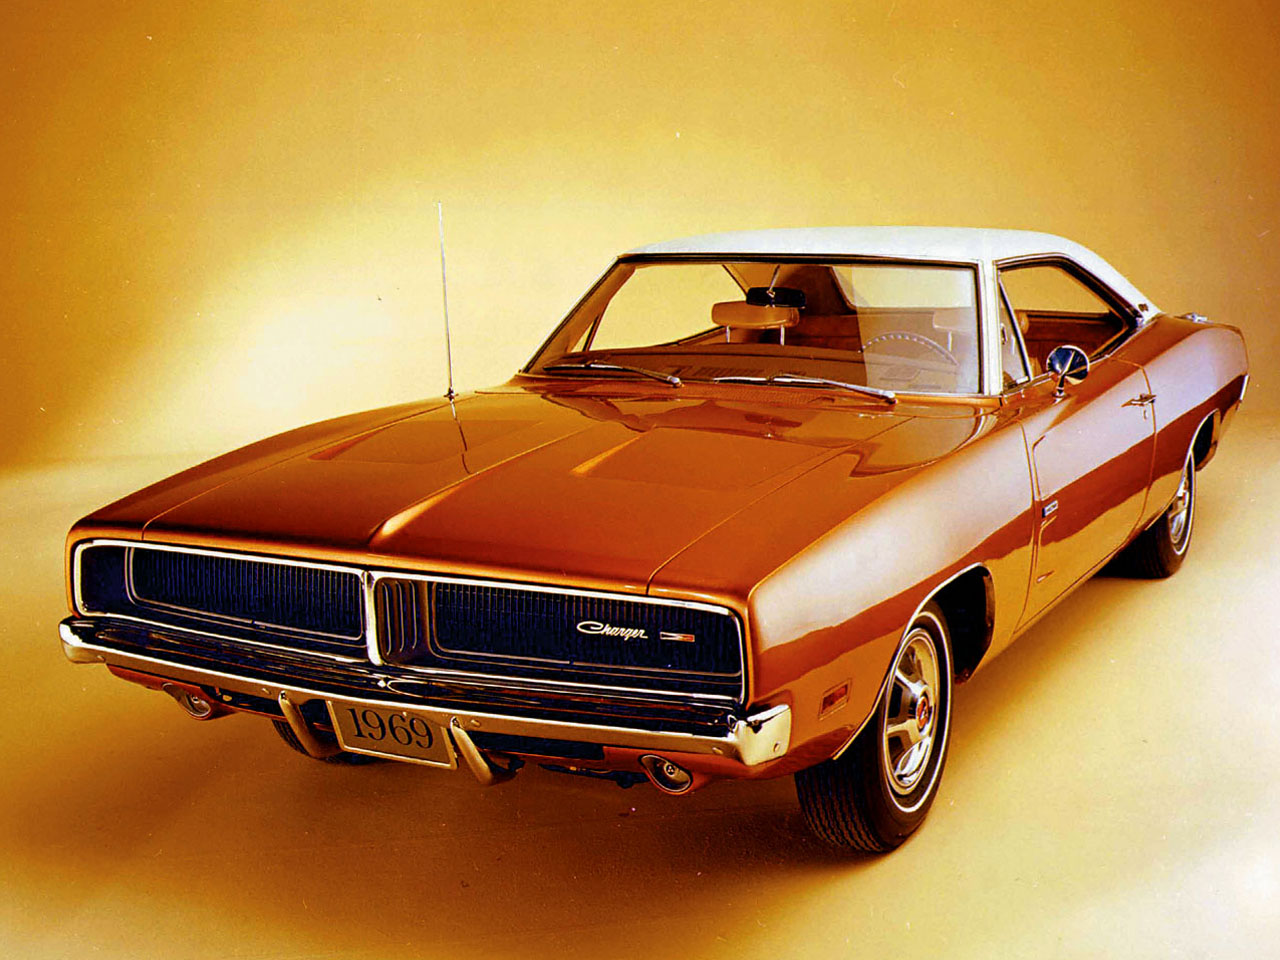 modified cars 1969 dodge charger. Black Bedroom Furniture Sets. Home Design Ideas